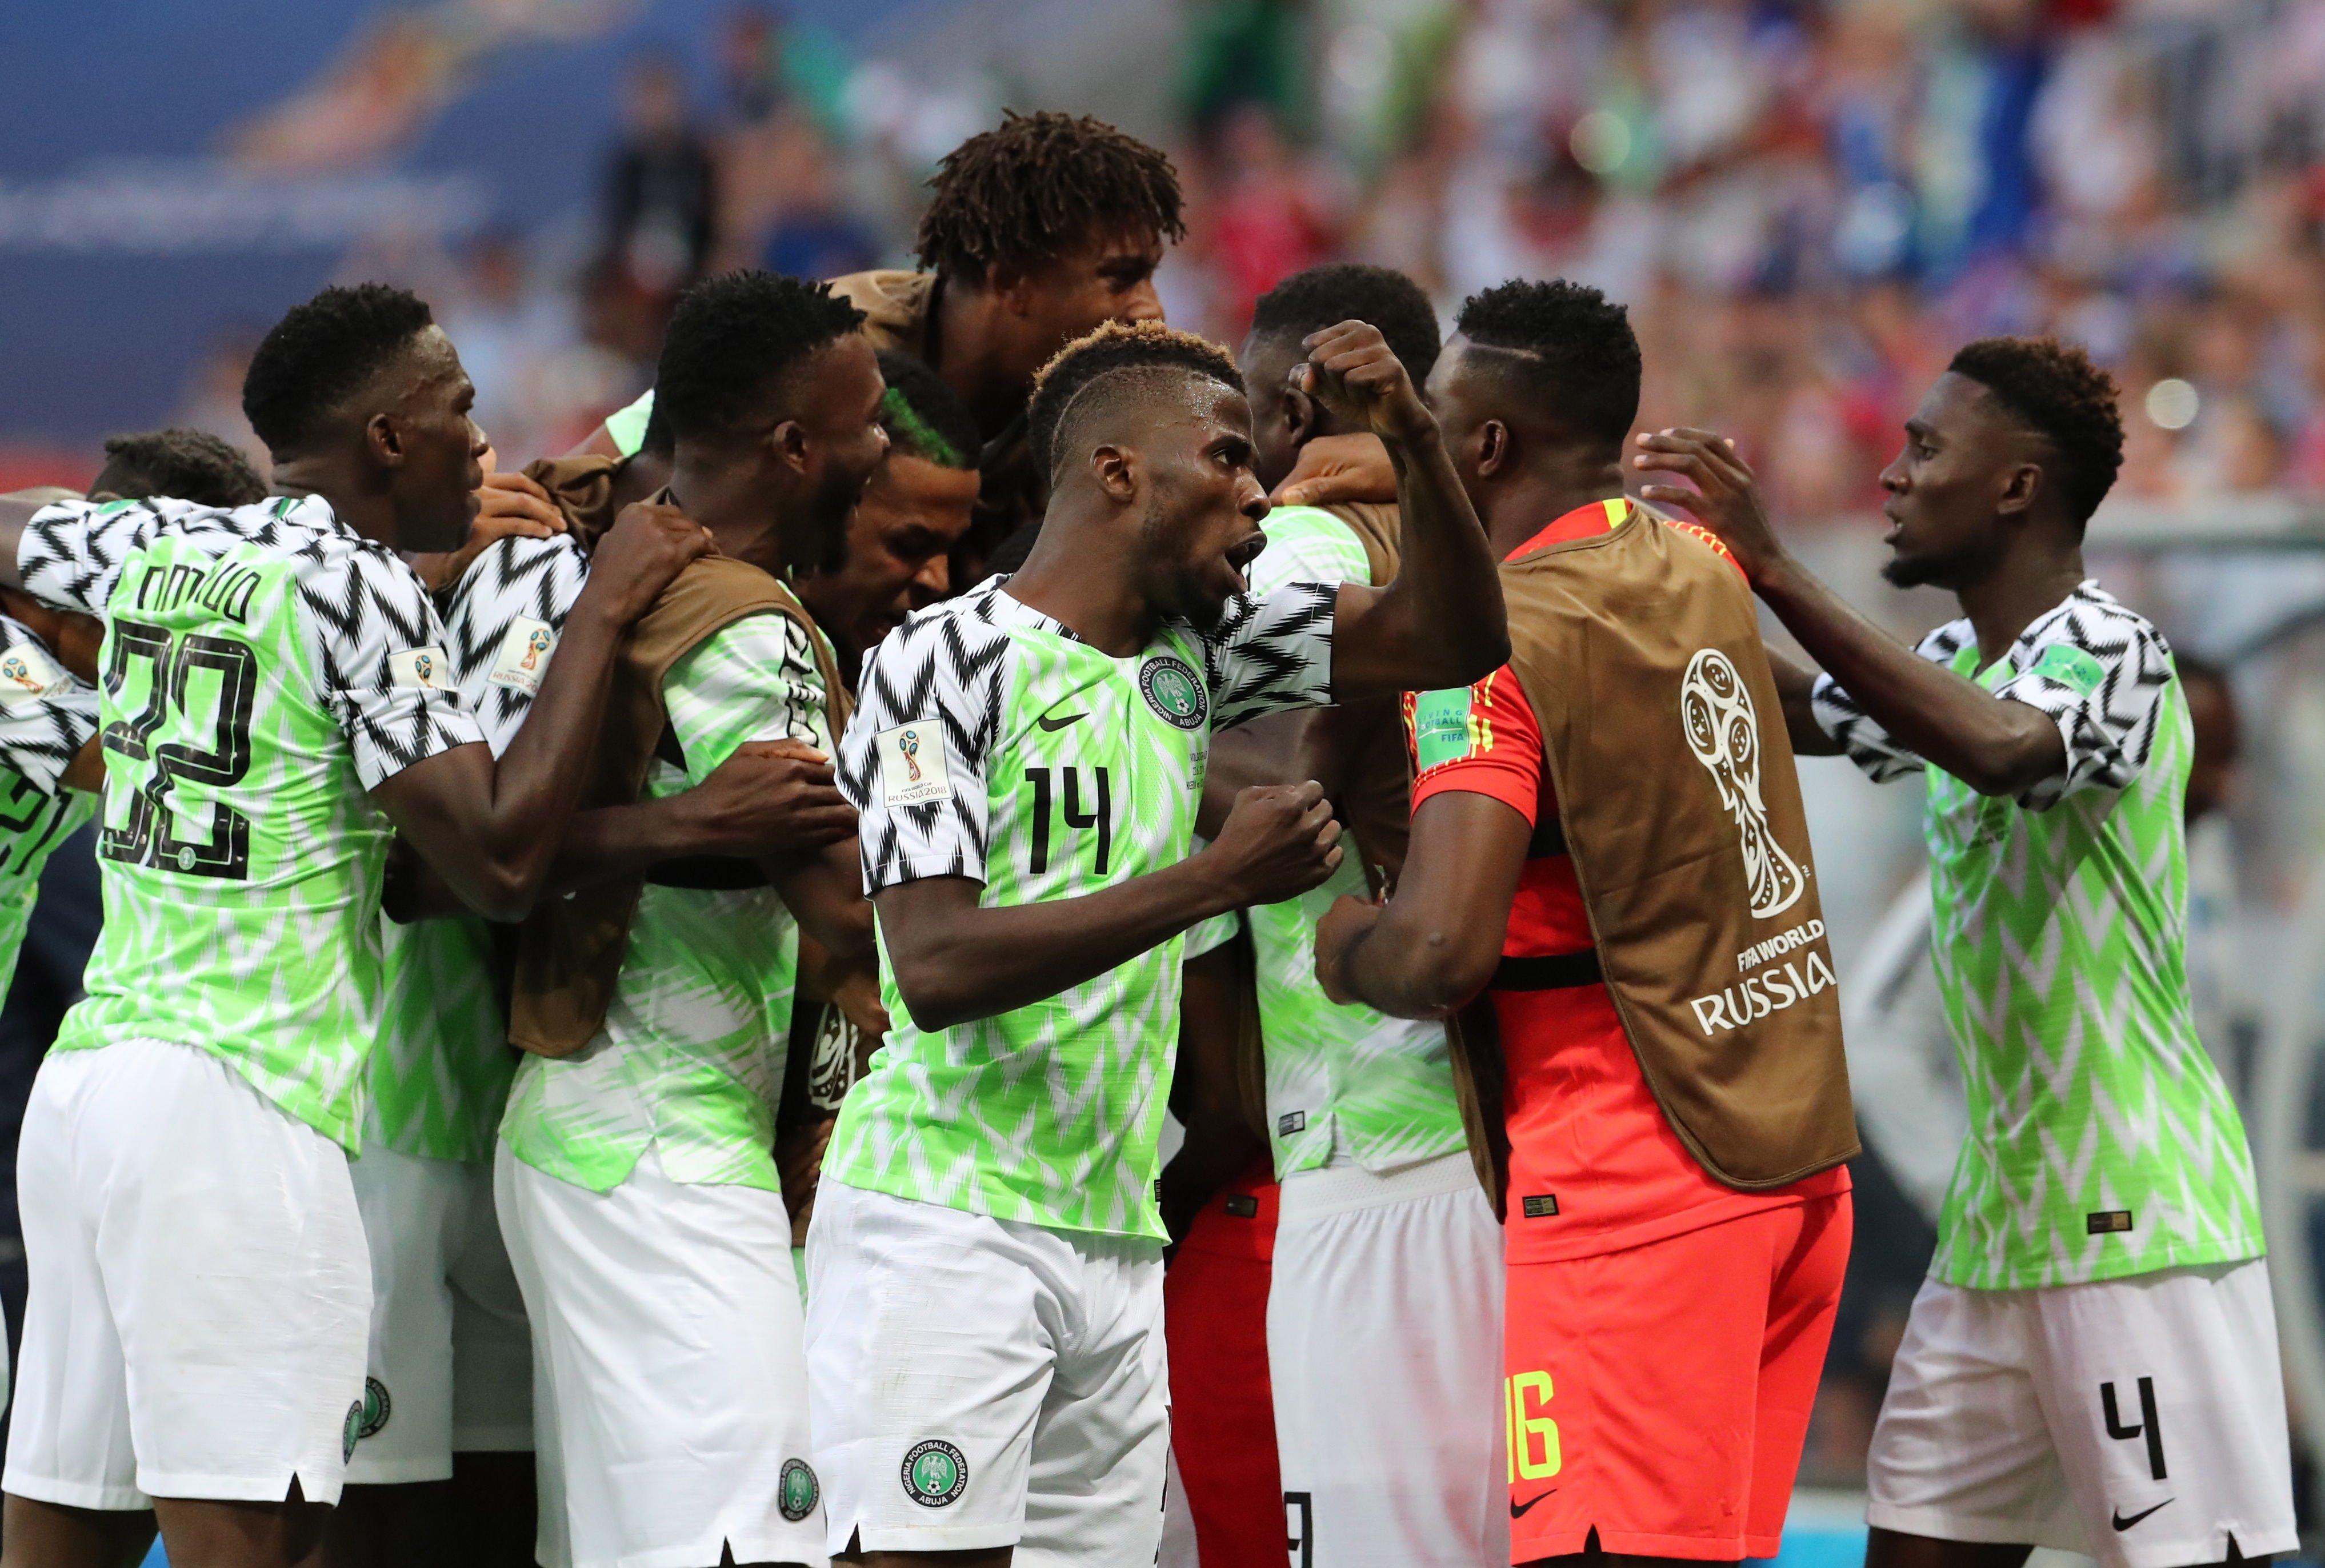 Pinya Nigeria Islandia Mundial Russia 2018 EFE